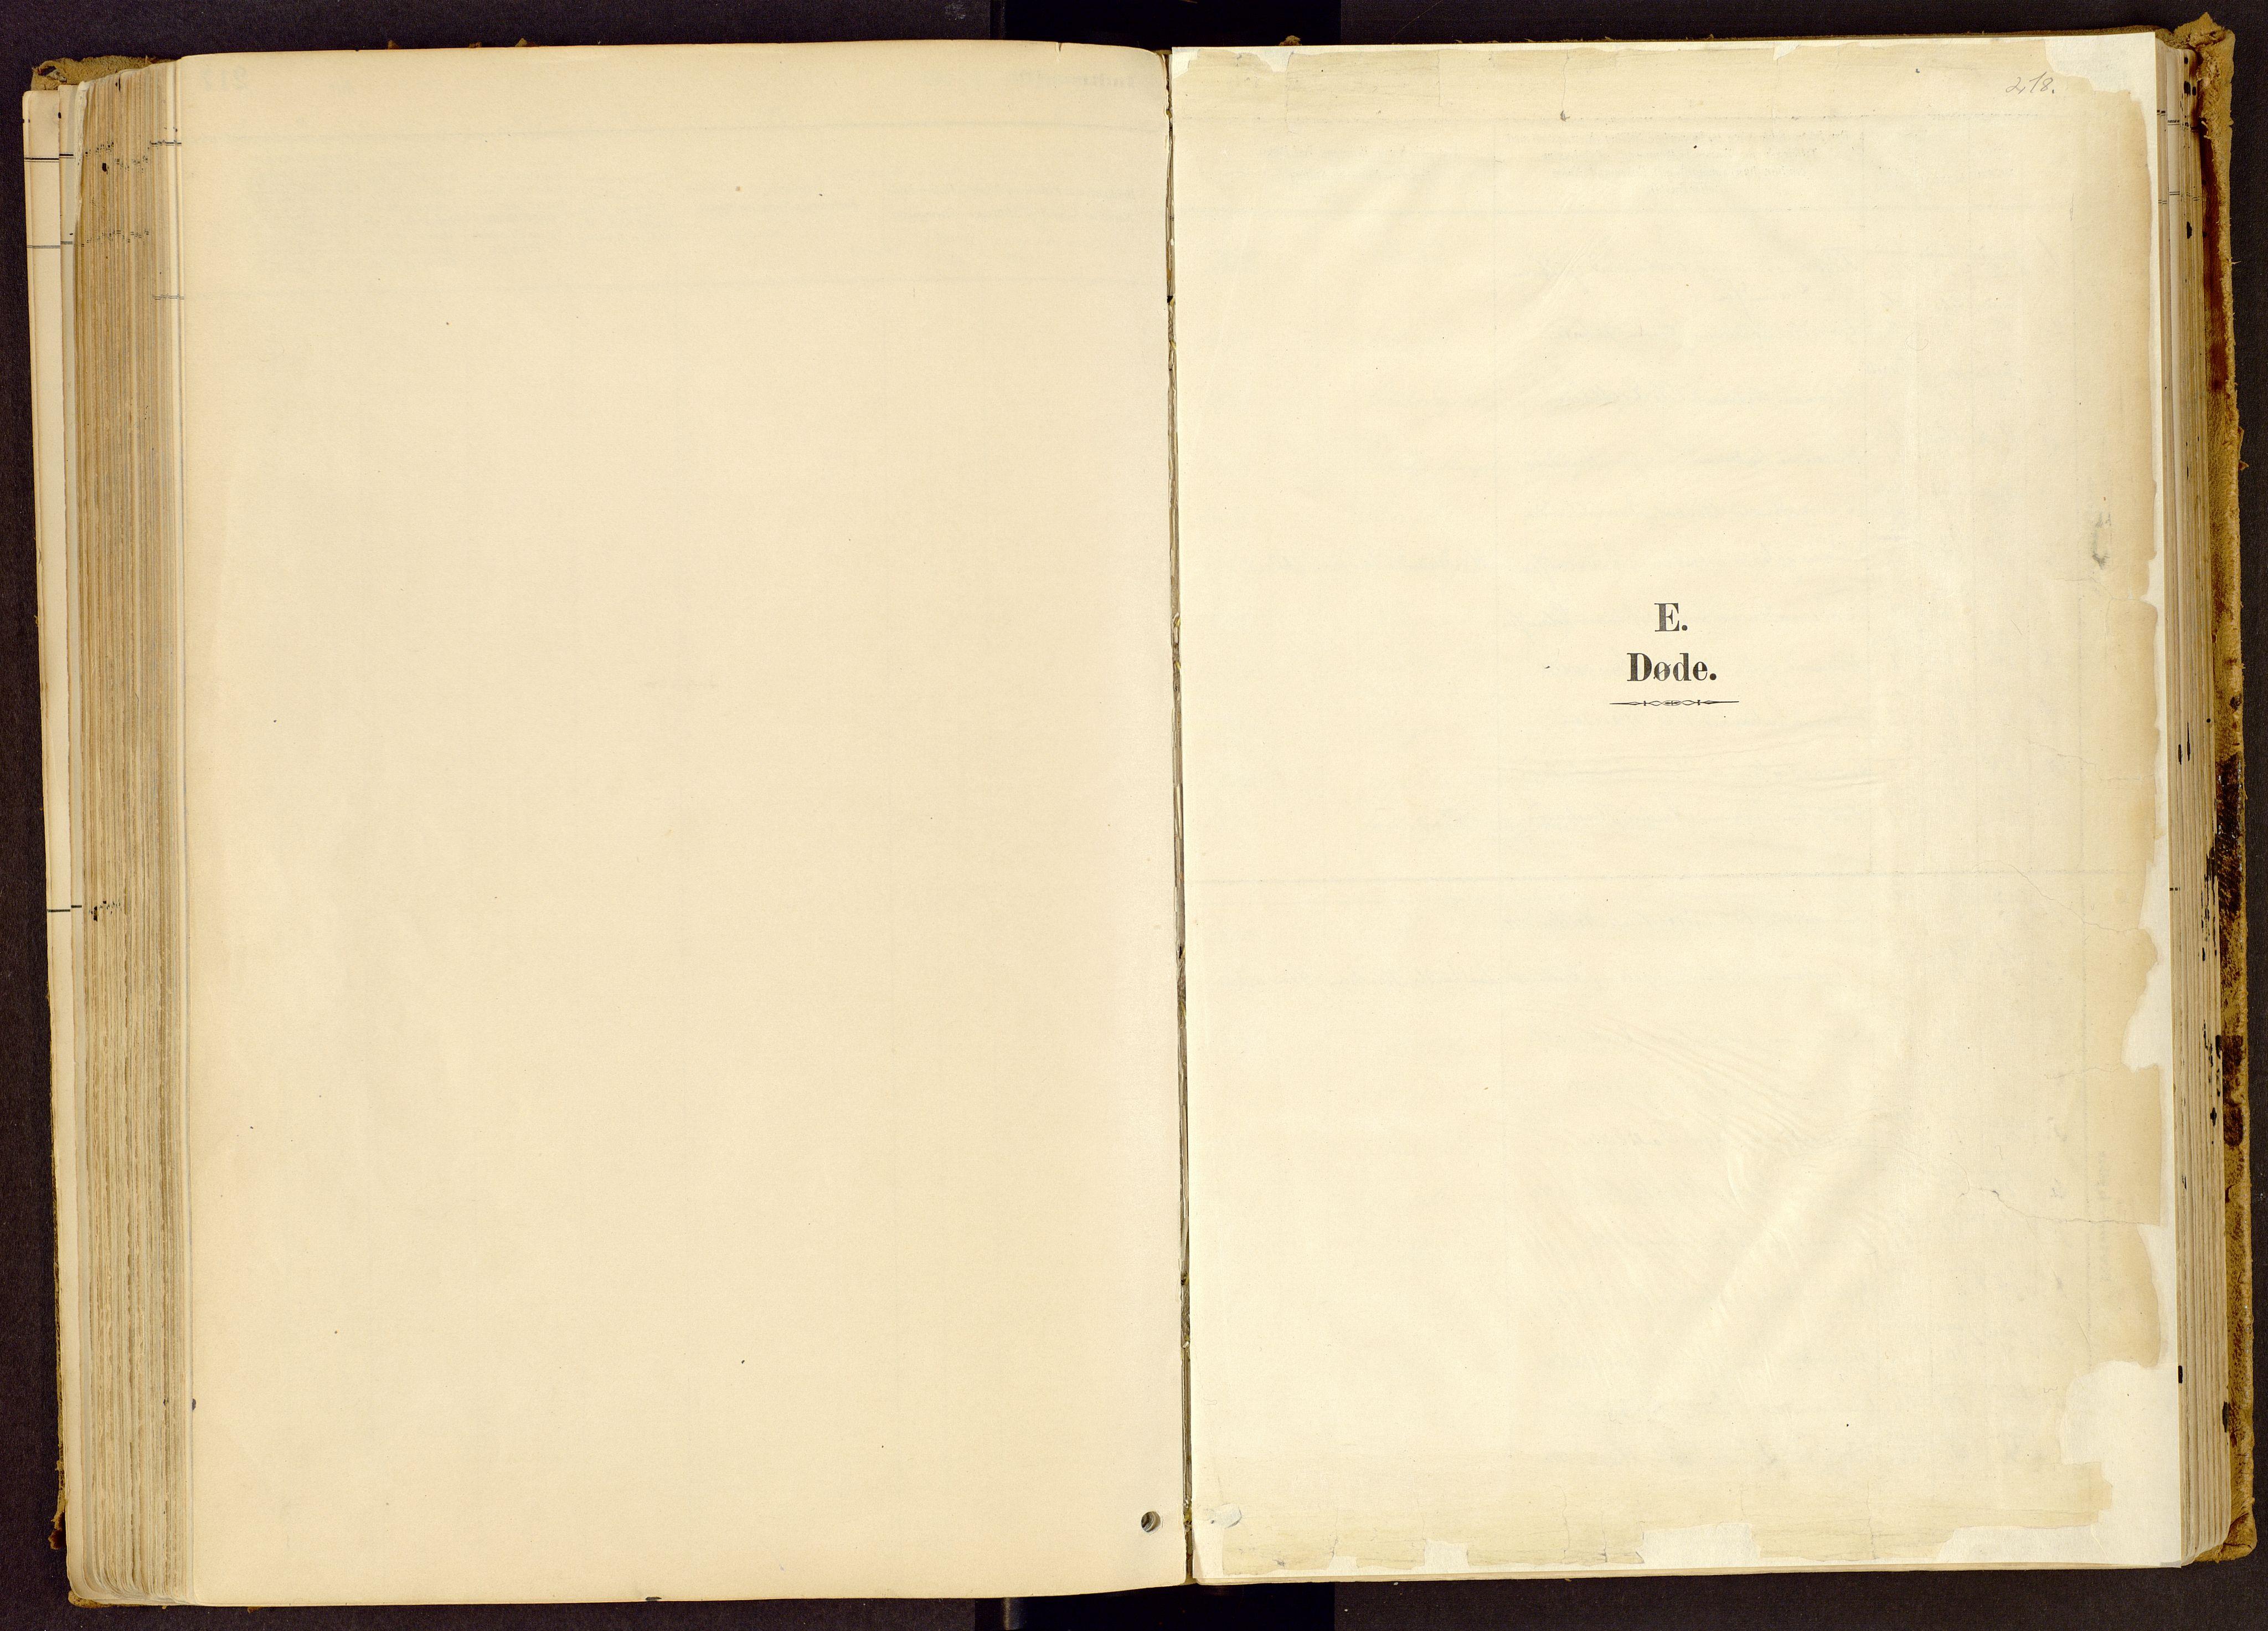 SAH, Vestre Gausdal prestekontor, Ministerialbok nr. 1, 1887-1914, s. 218